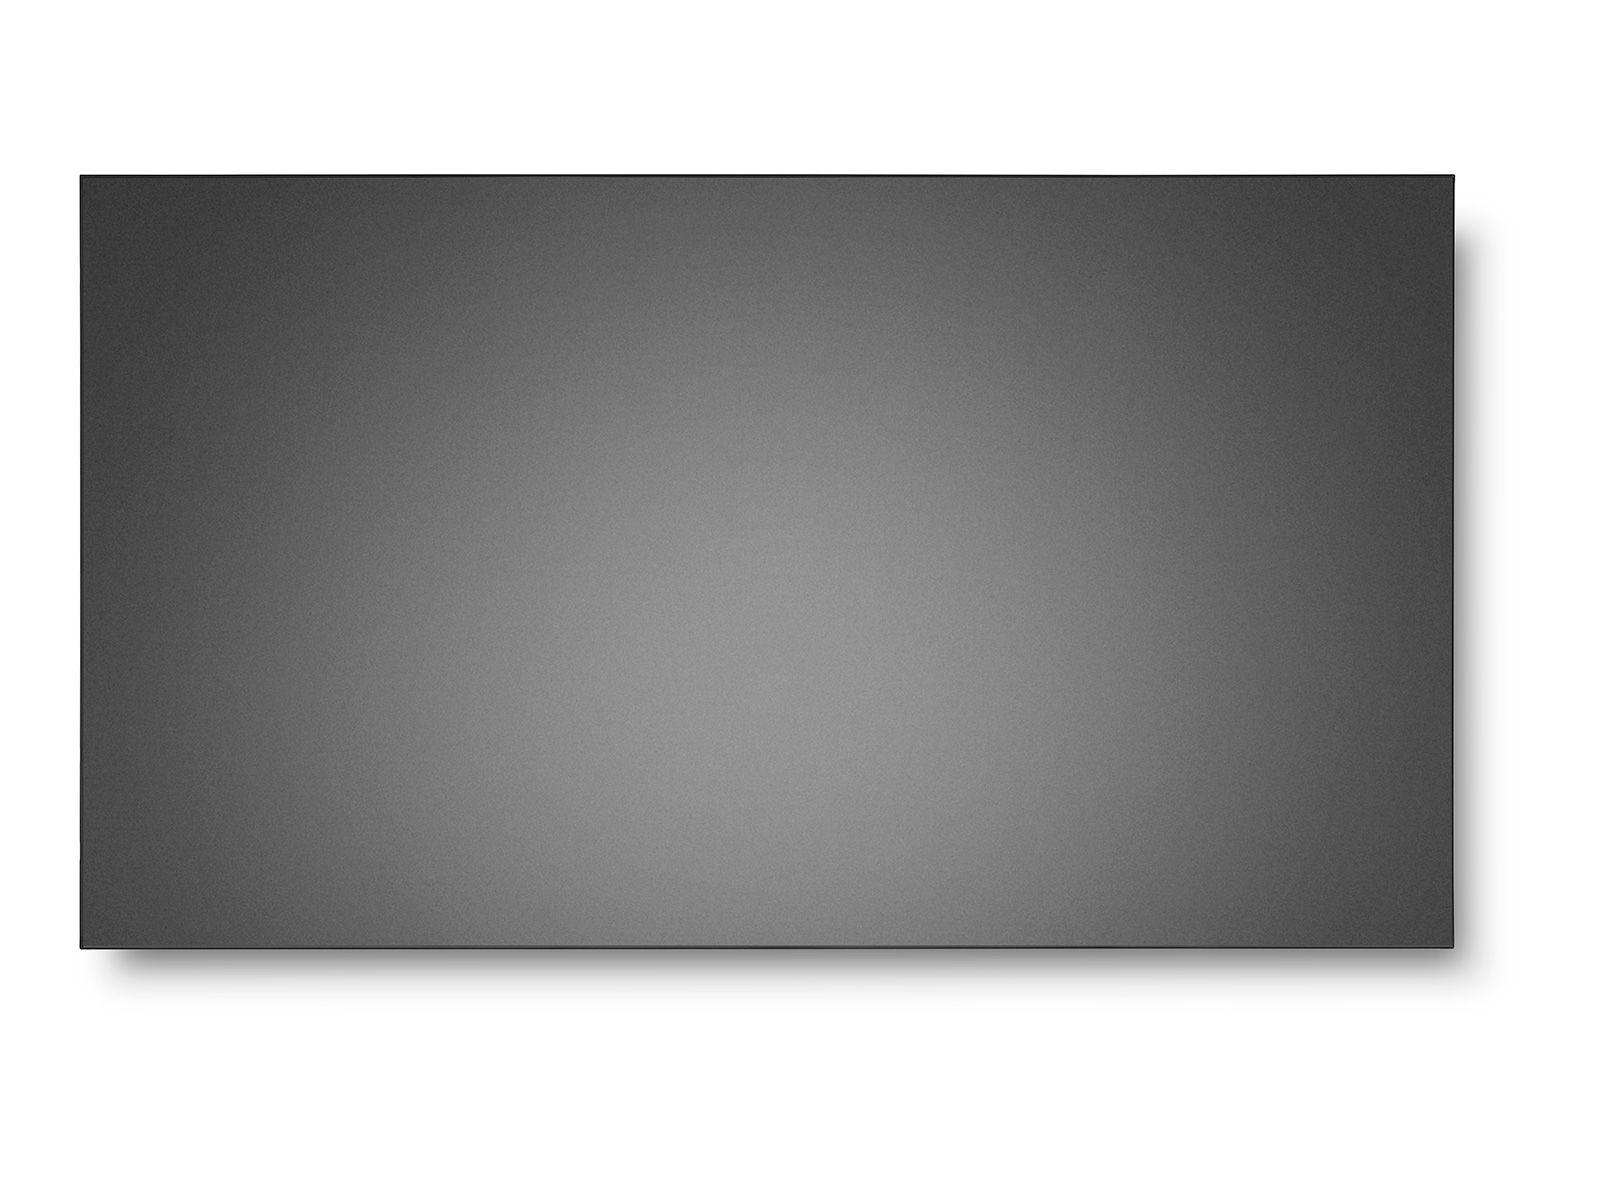 Televisions & Recorders MultiSync UN552VS 55in LED FHD Videowall